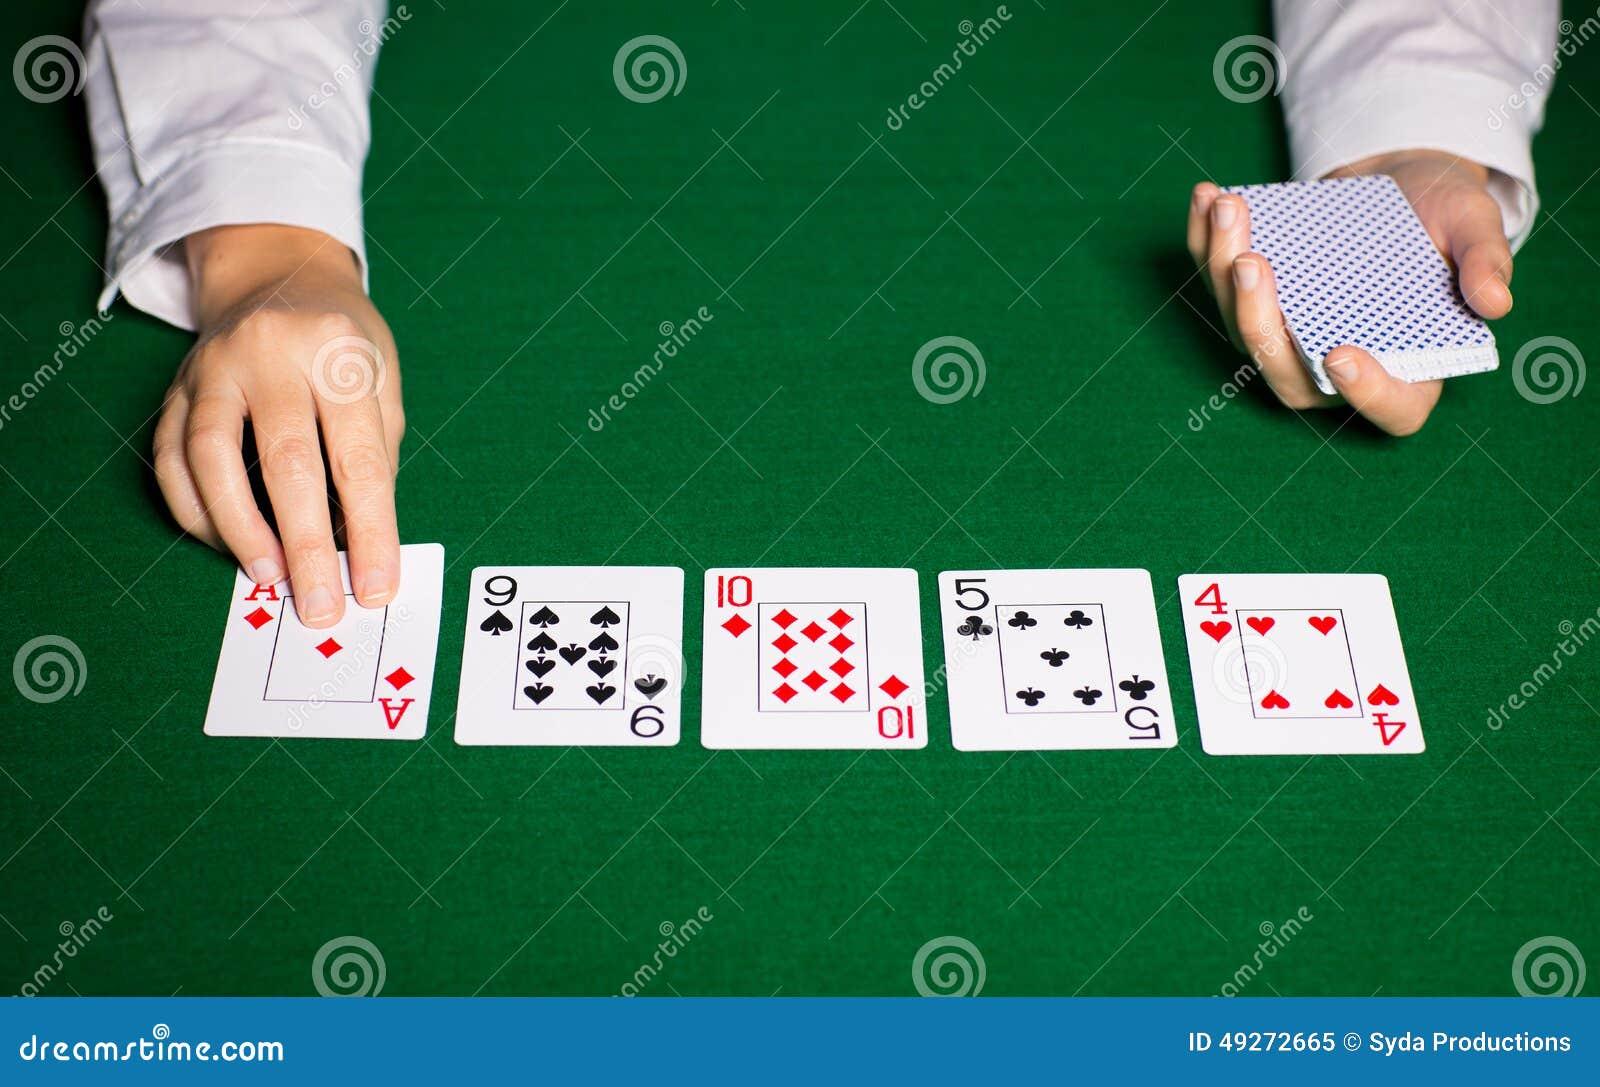 Poker entertainment